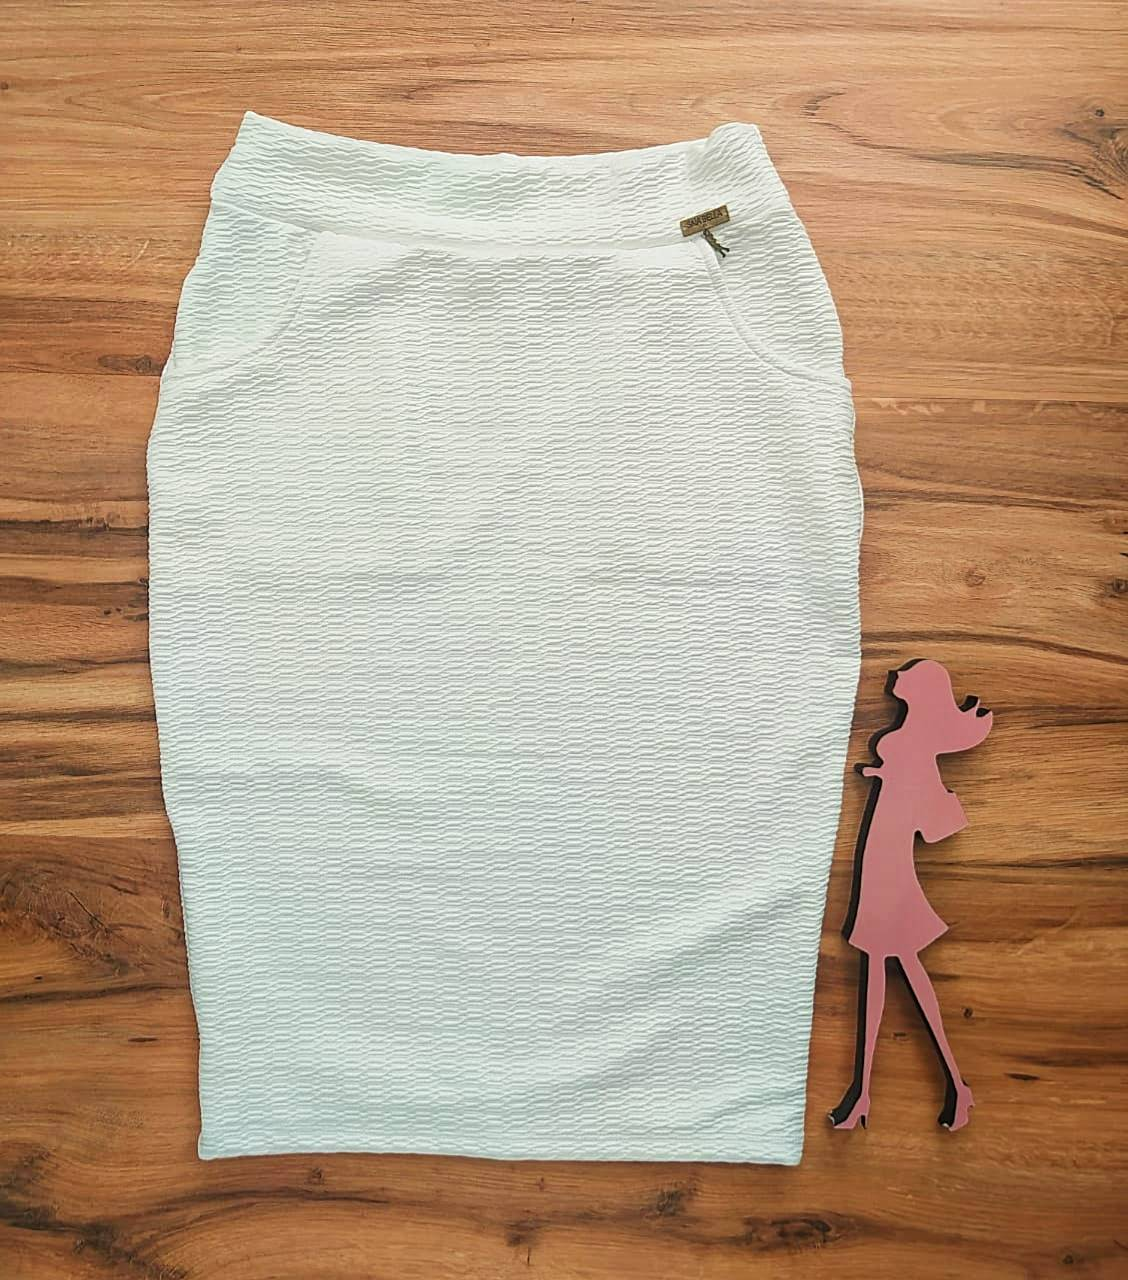 Saia Lápis Mayra Saia Bella cod SB8018803.Branco